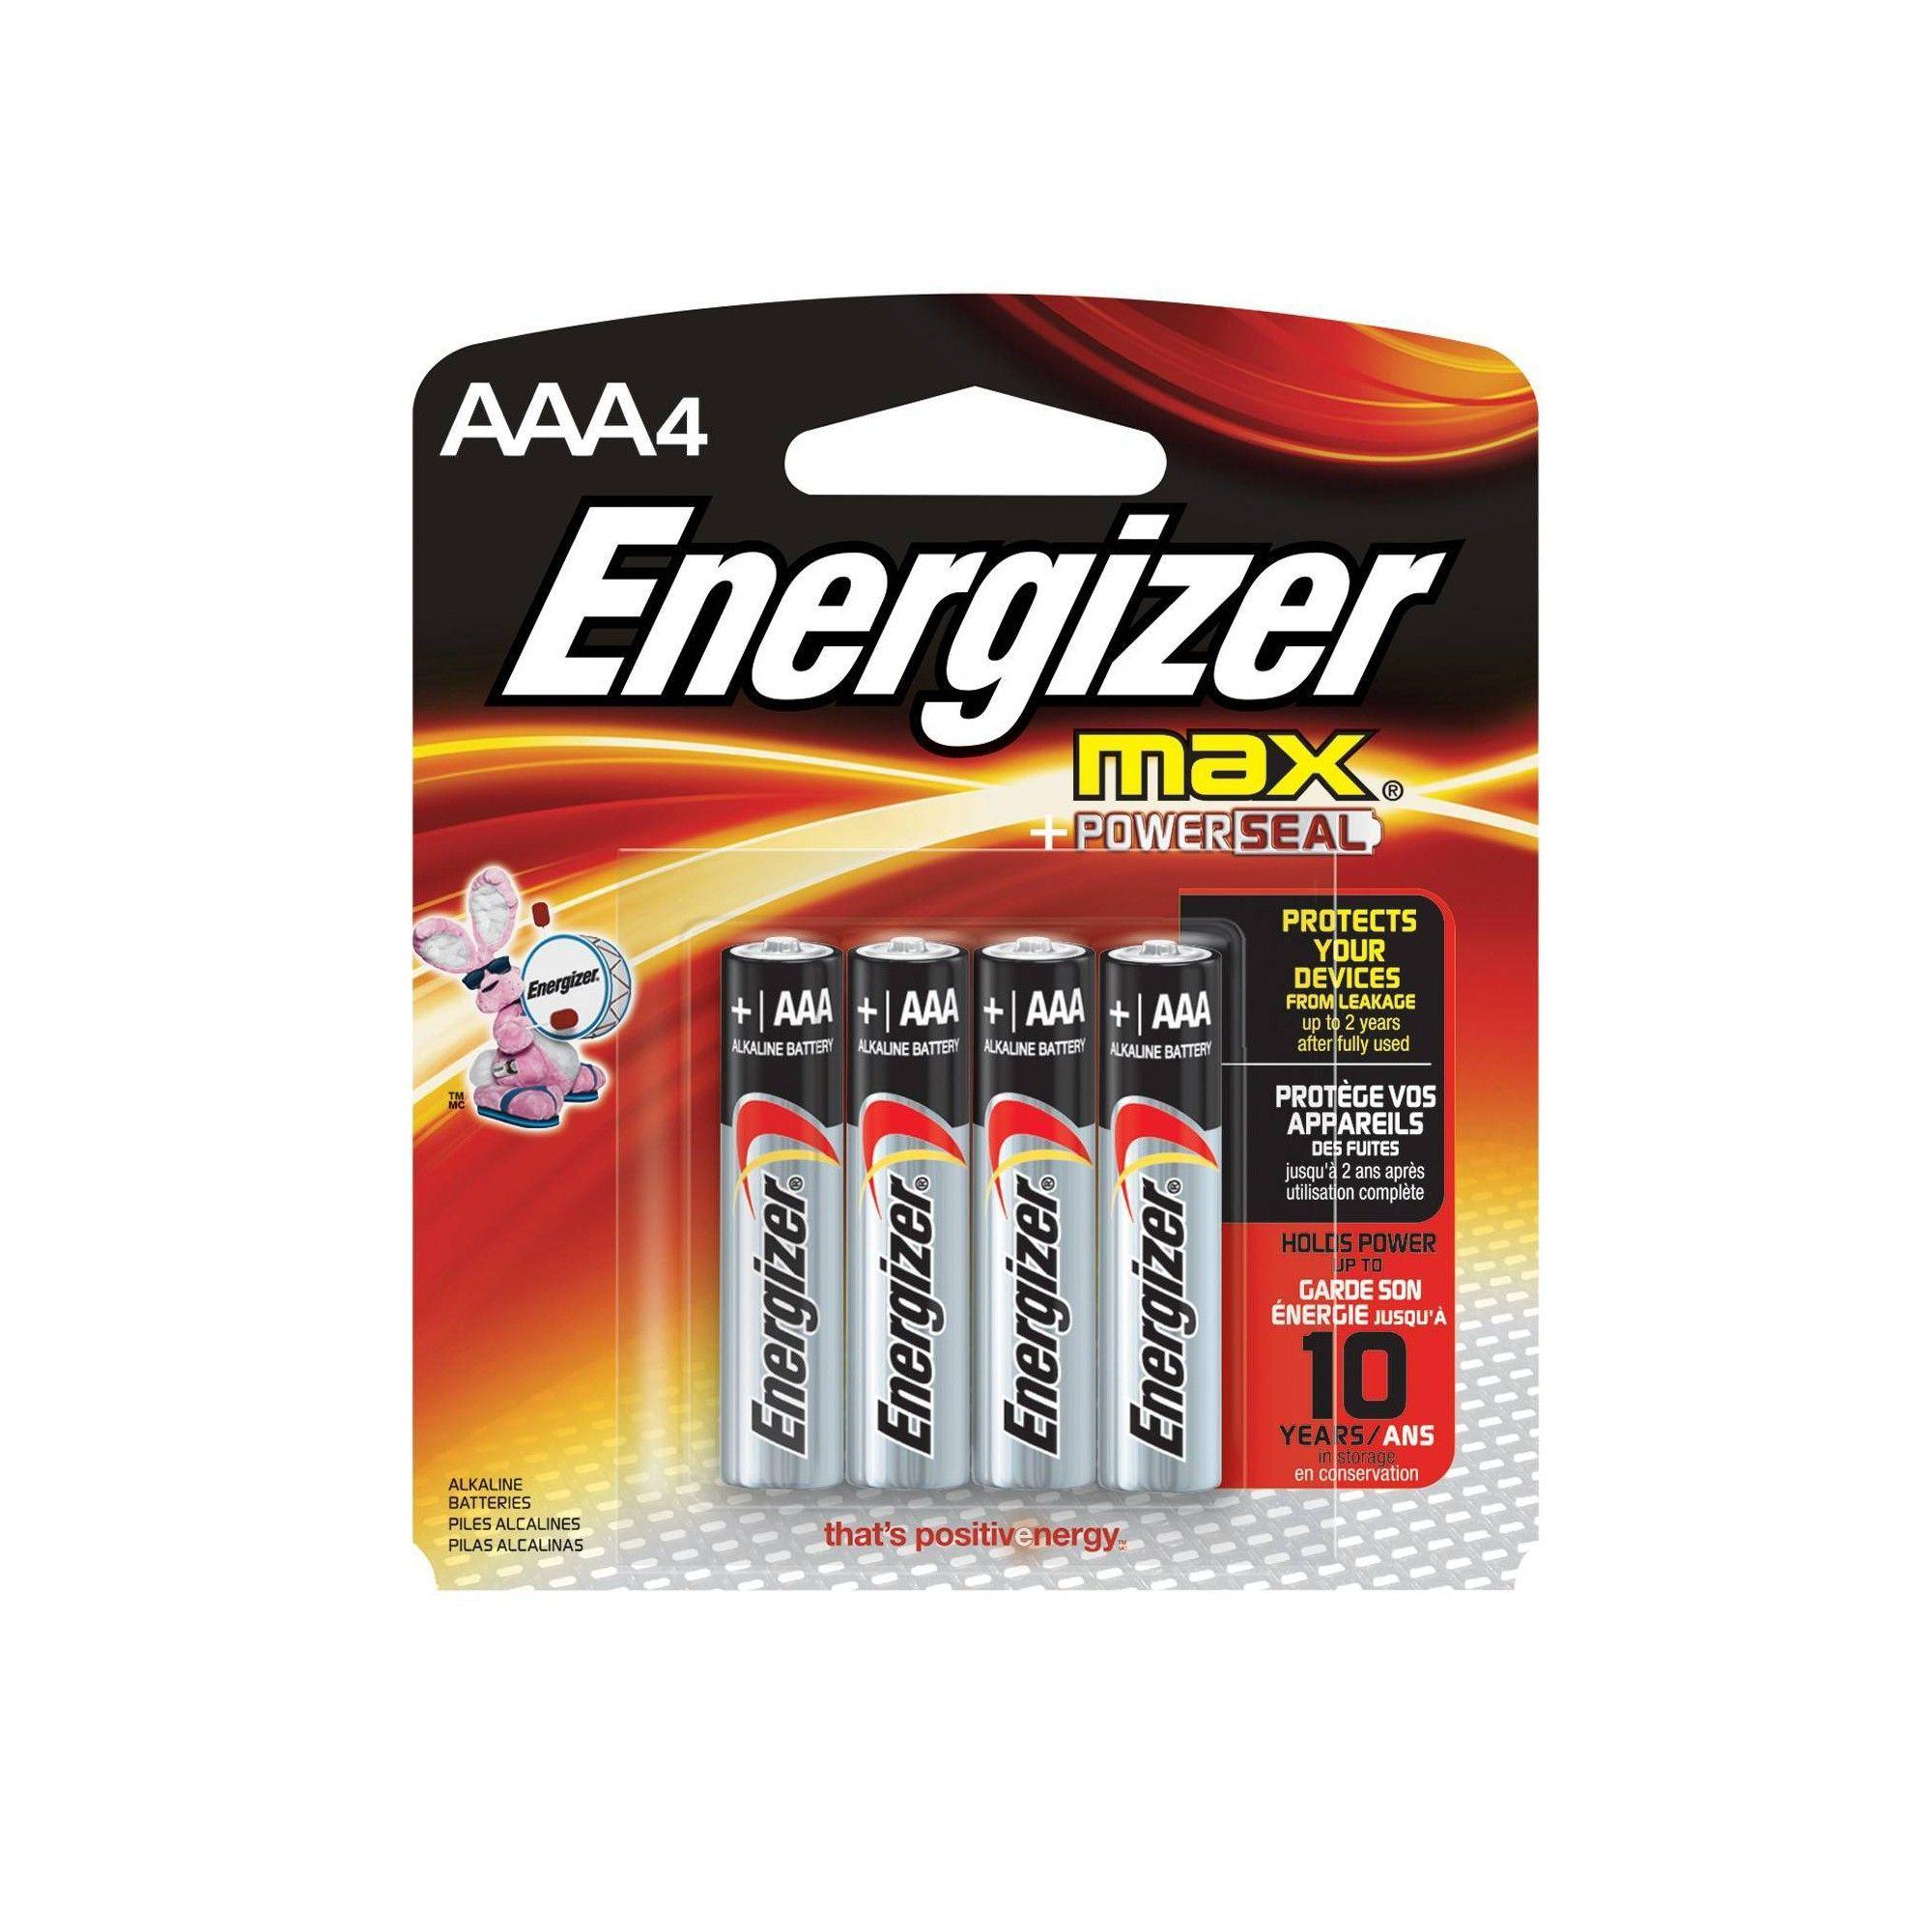 Energizer Max Aaa Batteries 4 Ct Alkaline Battery Digital Camera